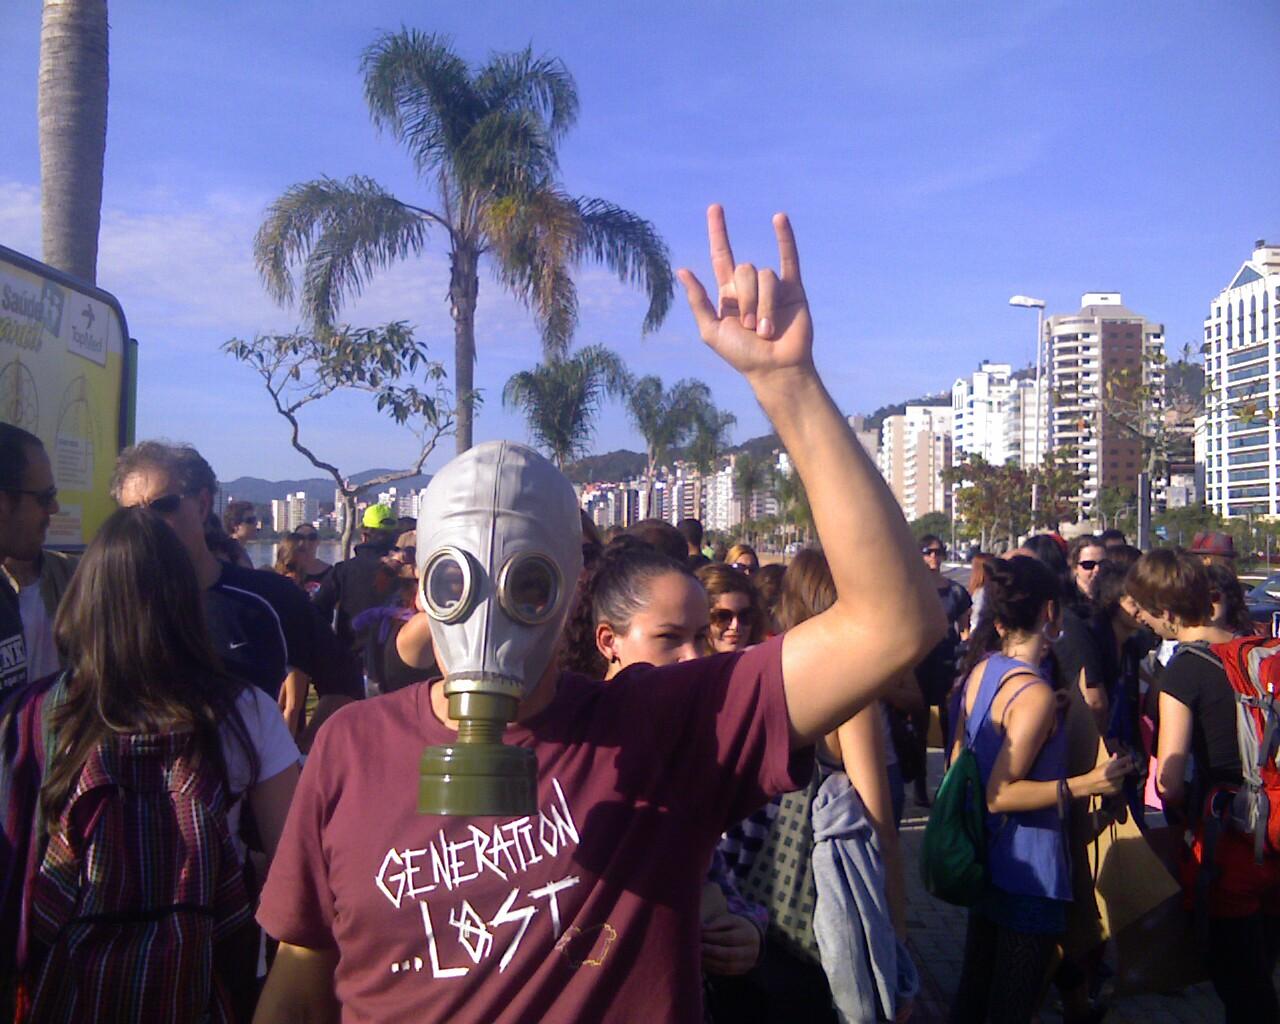 #PareBeloMnte na #MarchadaLiberdade em #Floripa